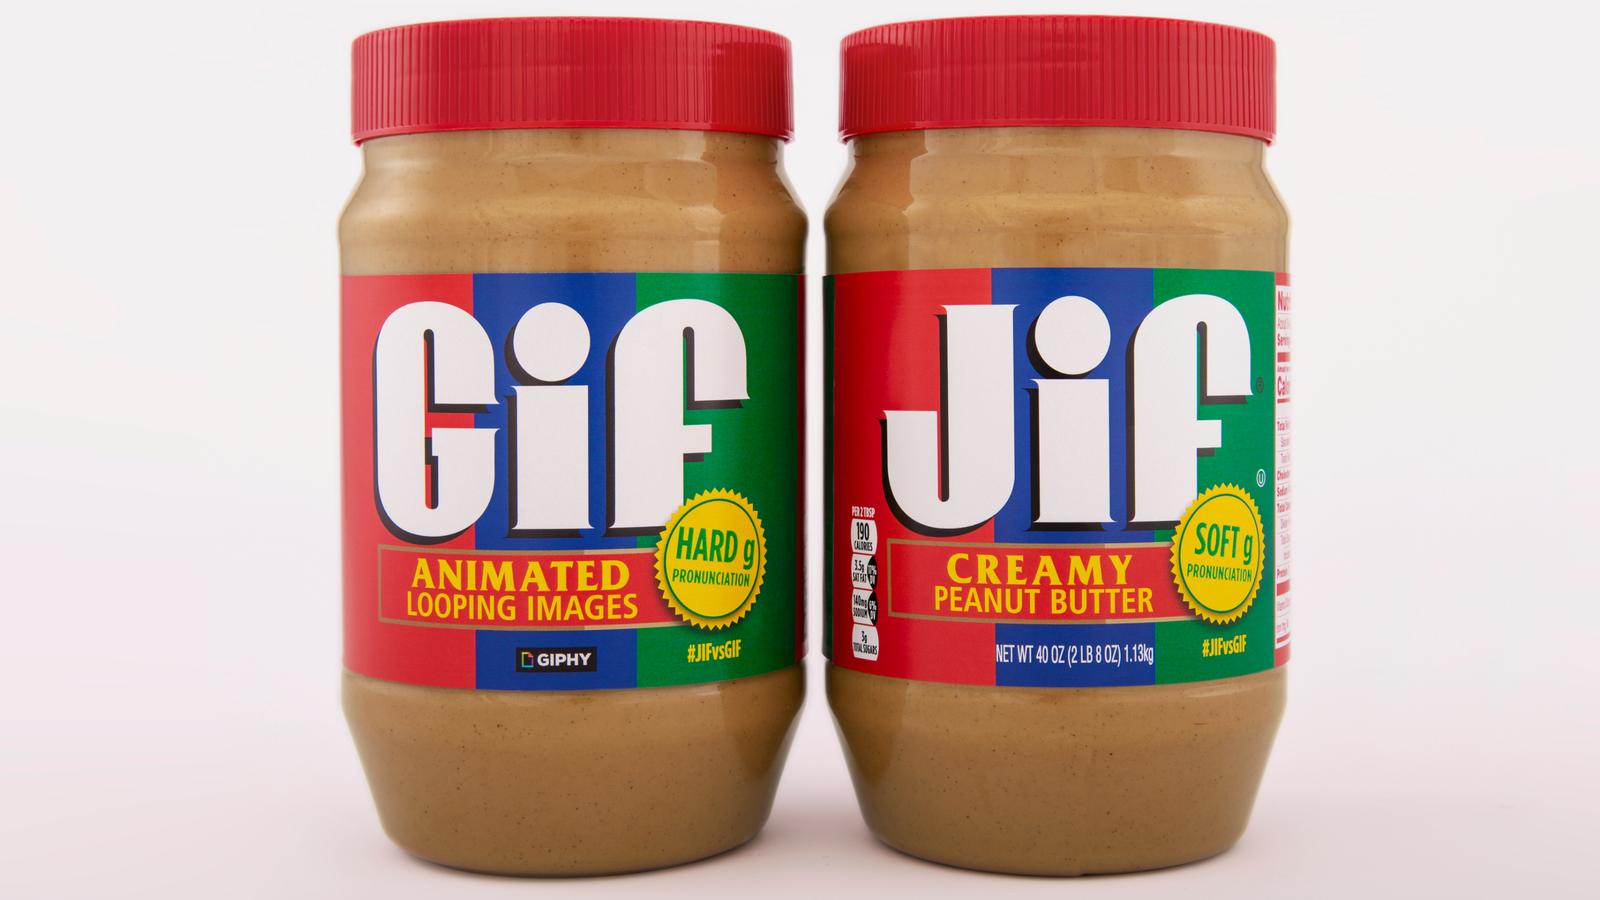 Jif and gif peanut butter jars